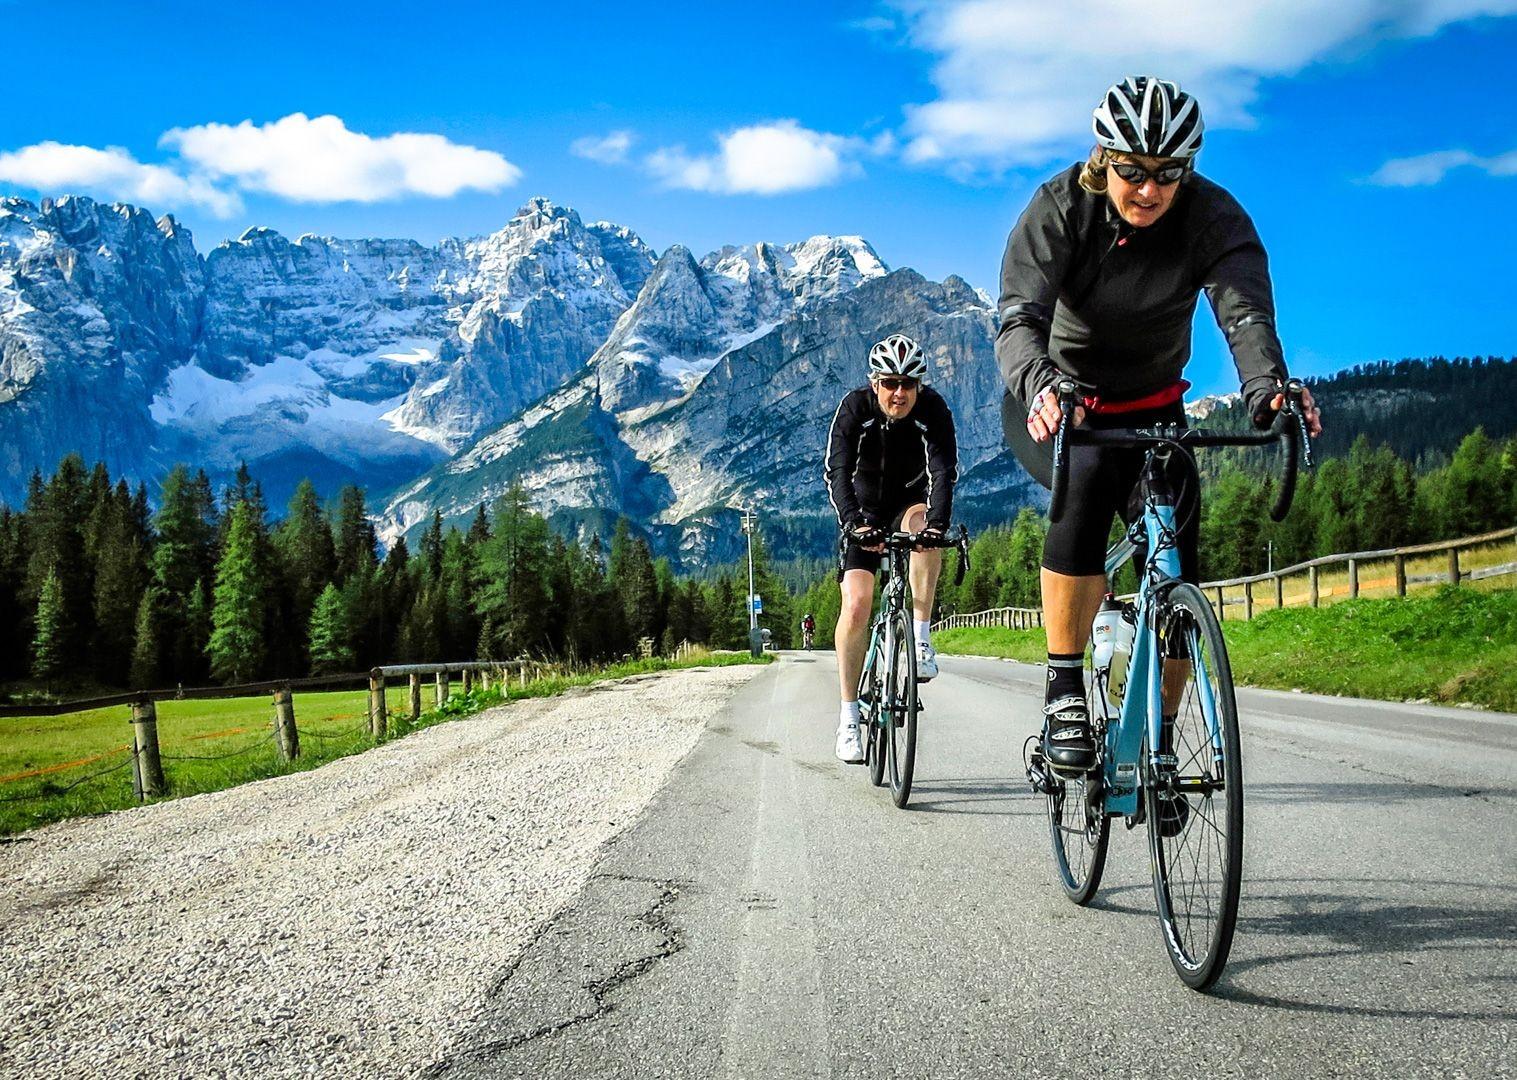 sella-ronda-italy-road-cycling-gran-fondo-holiday.jpg - Italy - Dolomiti Discoverer - Guided Road Cycling Holiday - Road Cycling